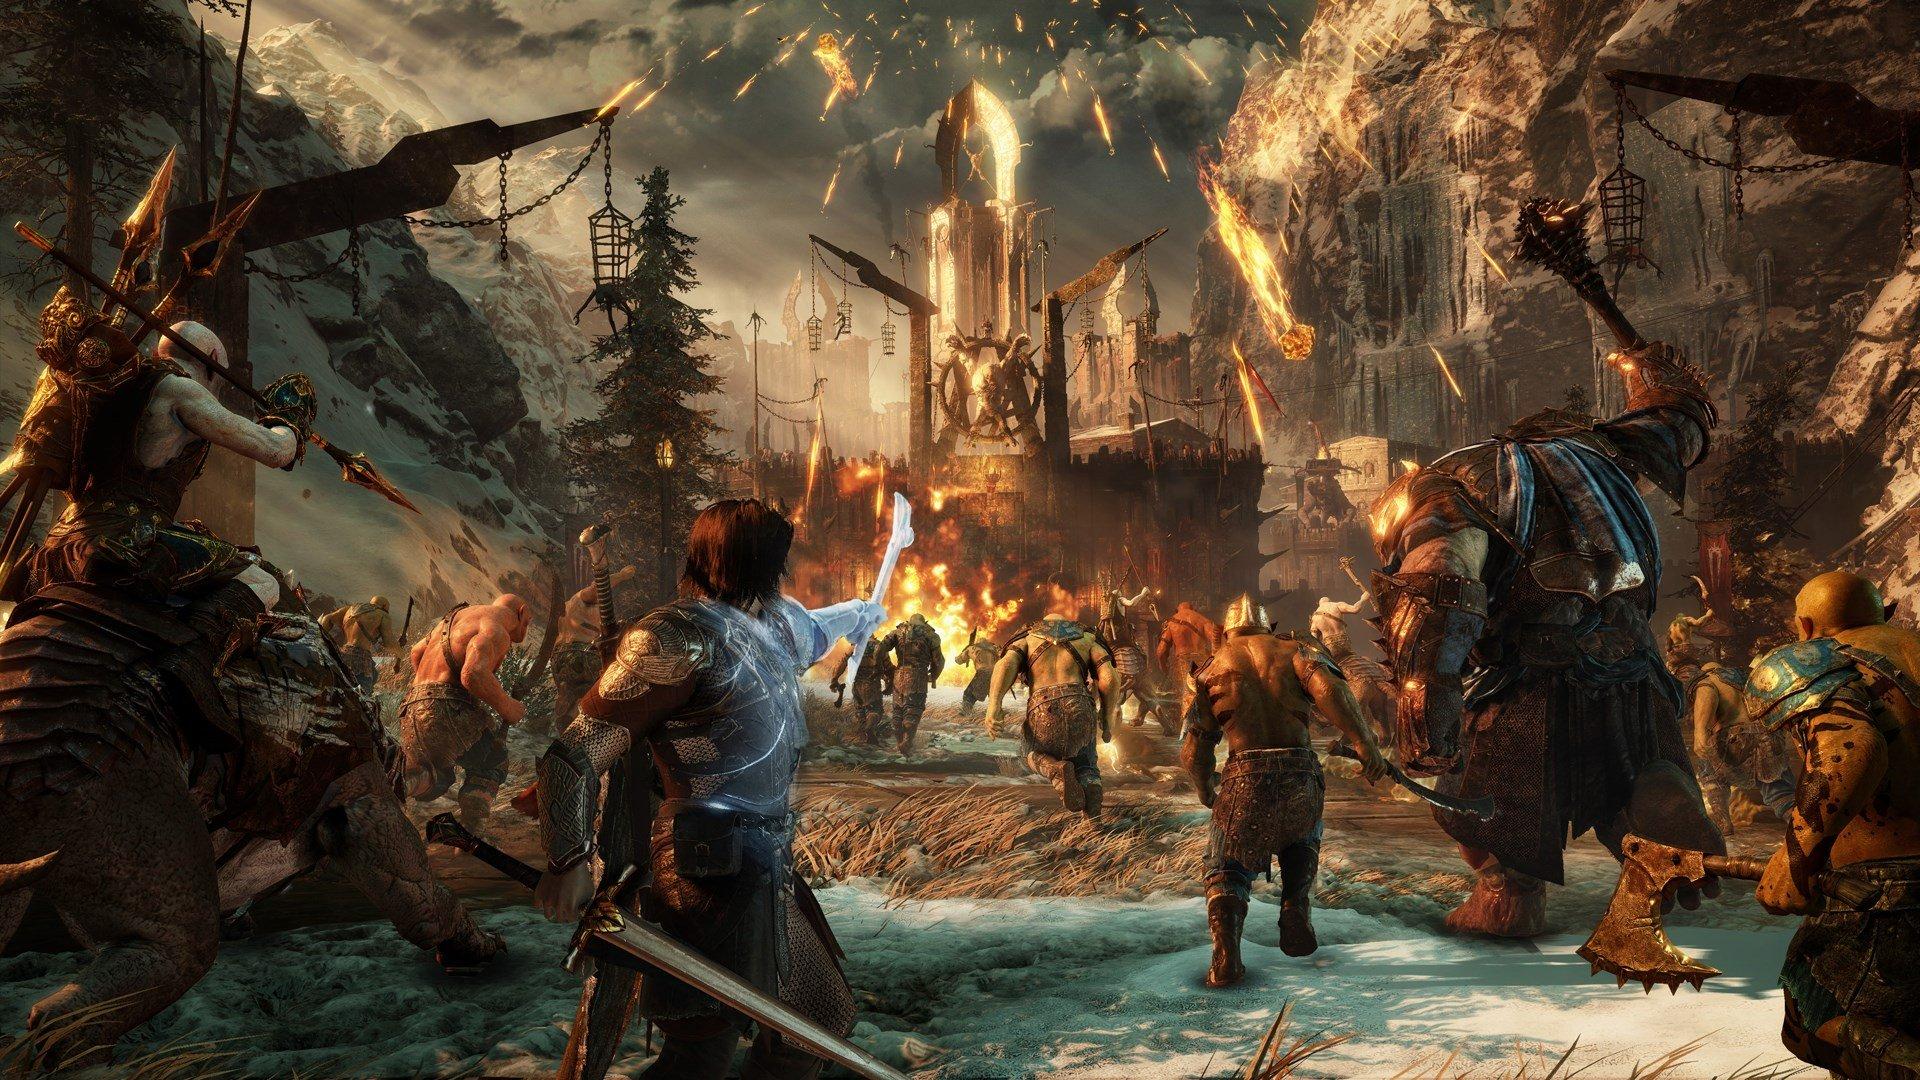 Middle-earth: Shadow of War - Desolation of Mordor